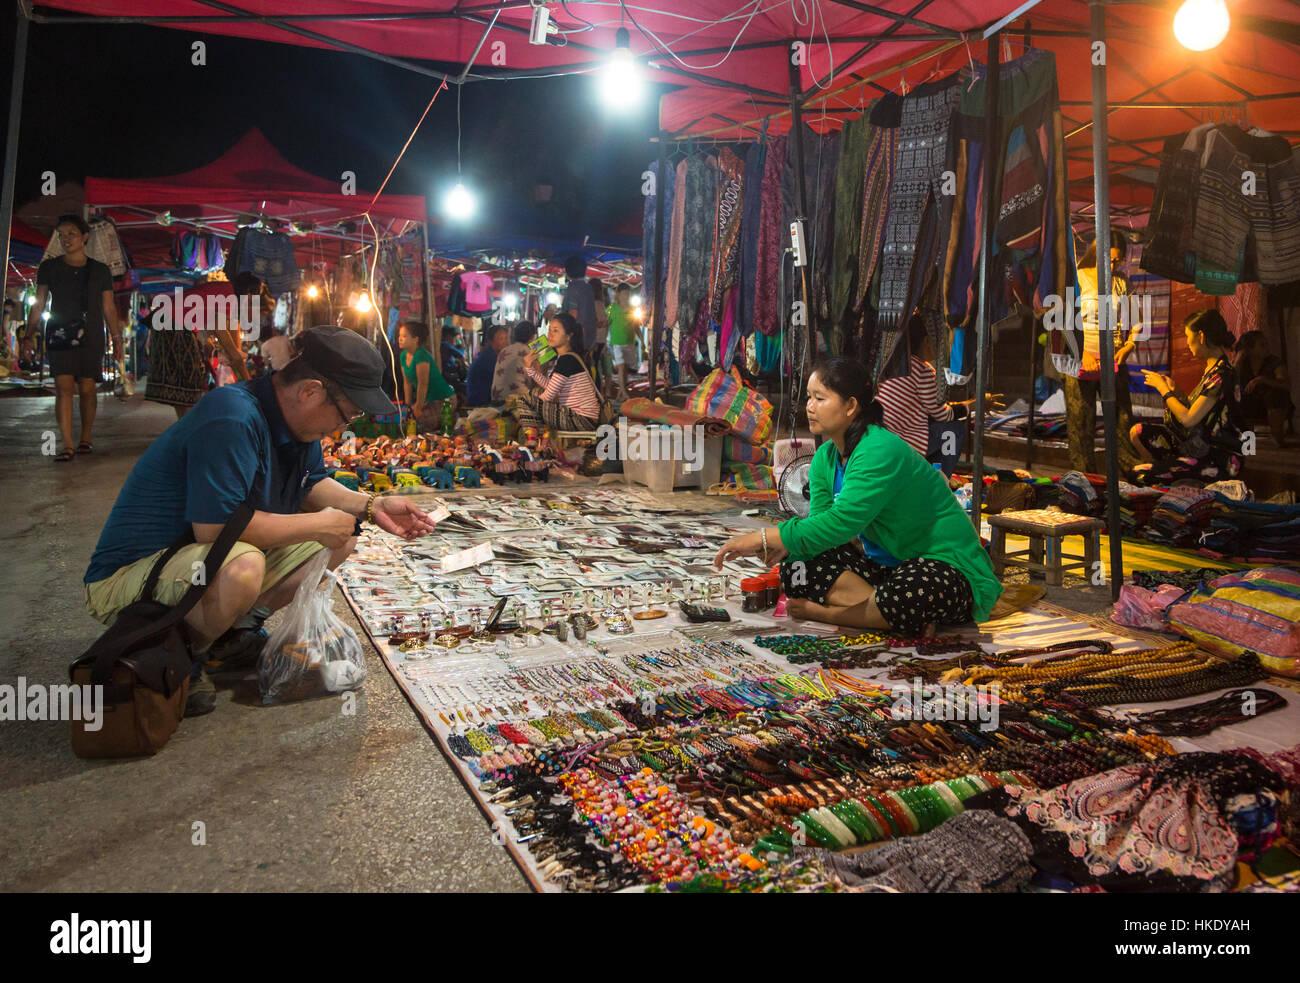 LUANG PRABANG, LAOS - 15 MAI 2015: un touriste cherche en souvenir du marché de nuit de Luang Prabang, Photo Stock